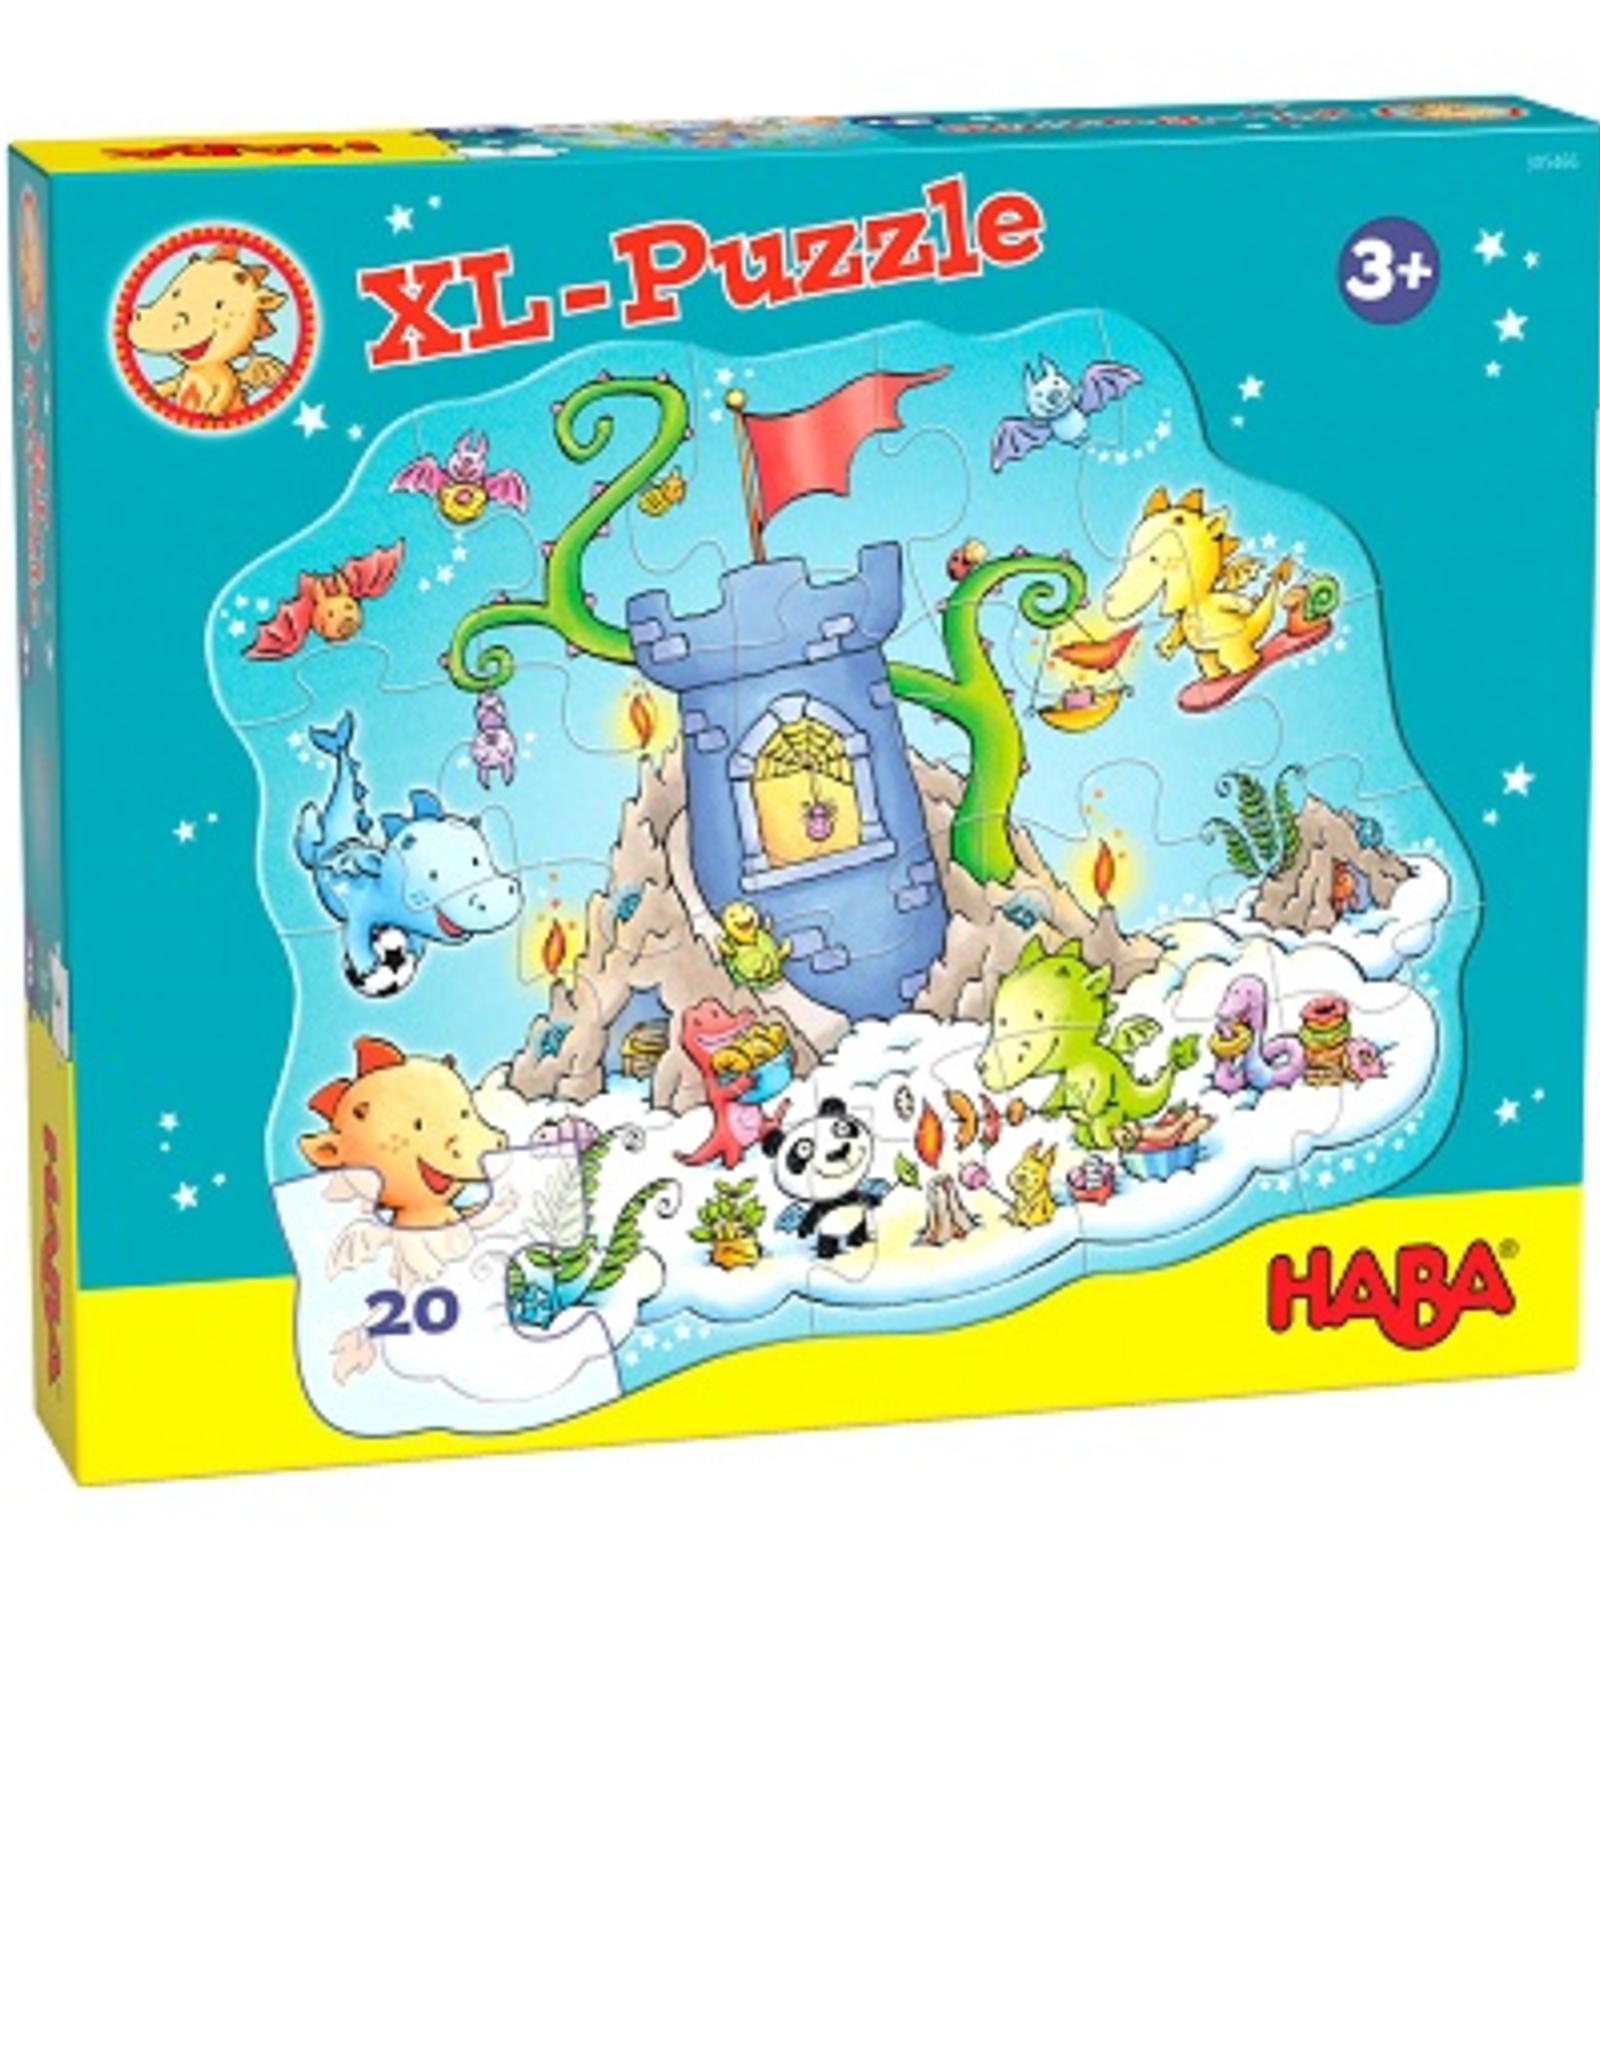 Haba  XL Puzzel draken 20 stuks  305466